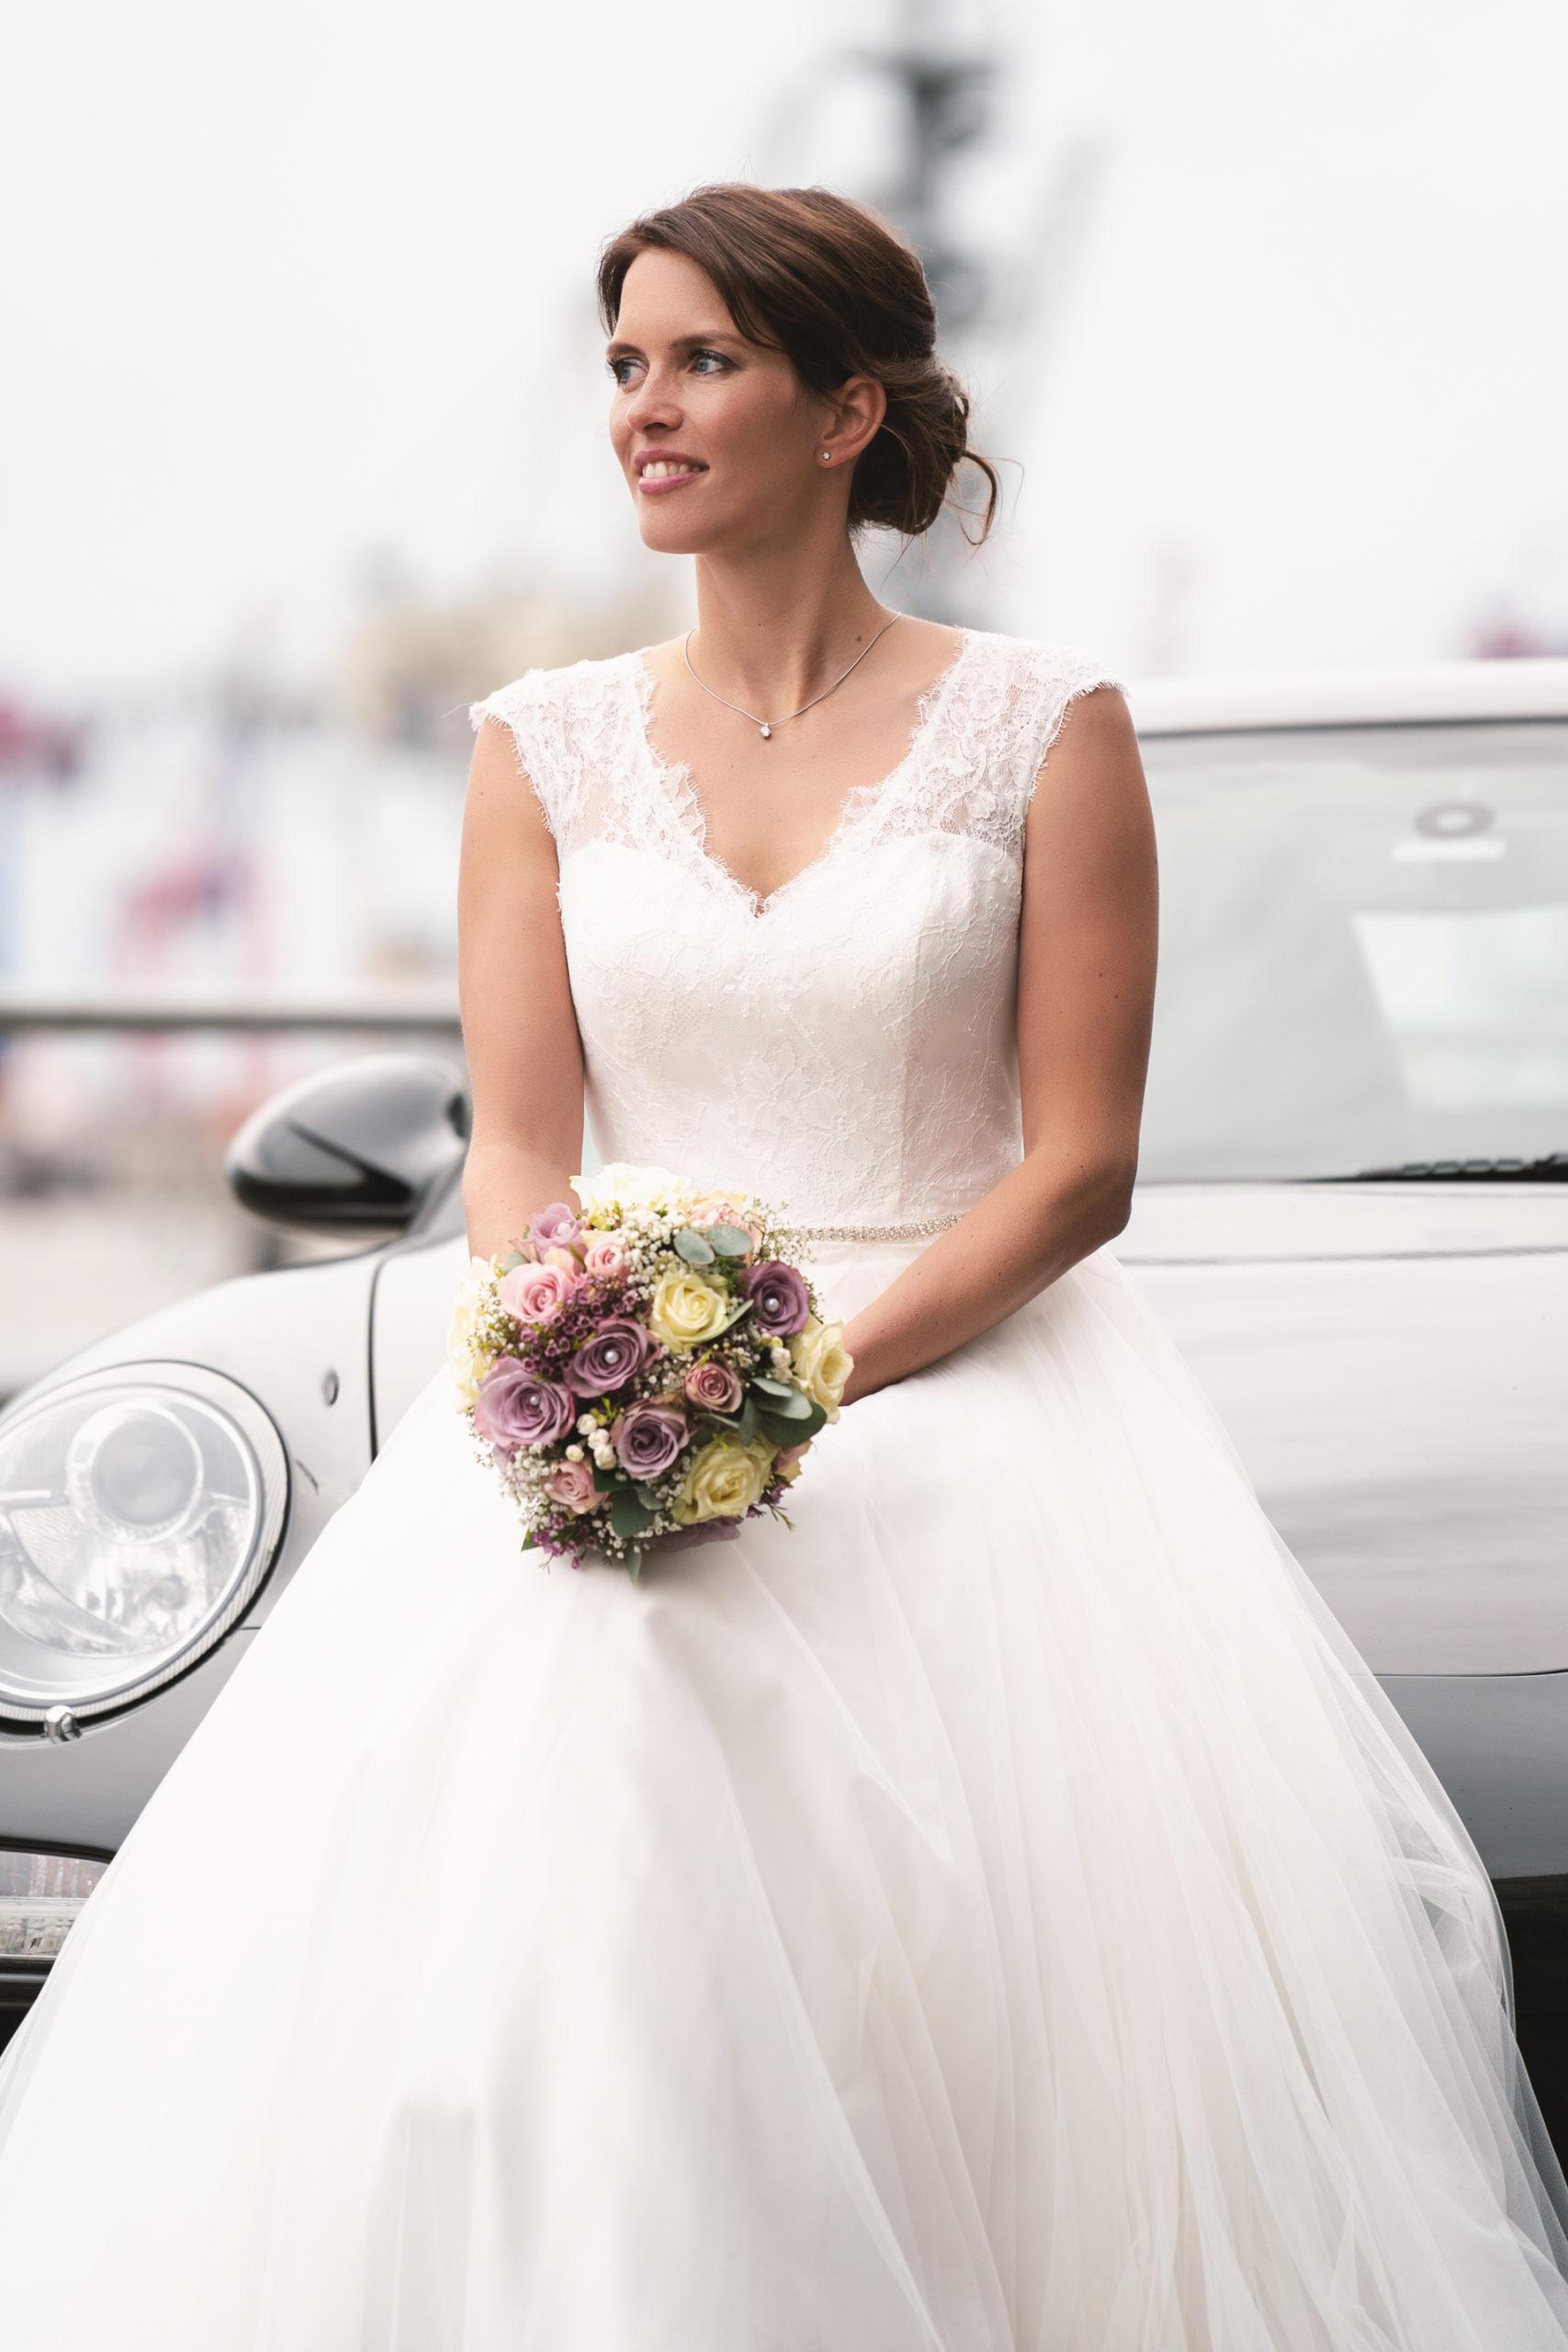 Hochzeitsfotografie - Hochzeitsfilm - Hamburg - ency wedding